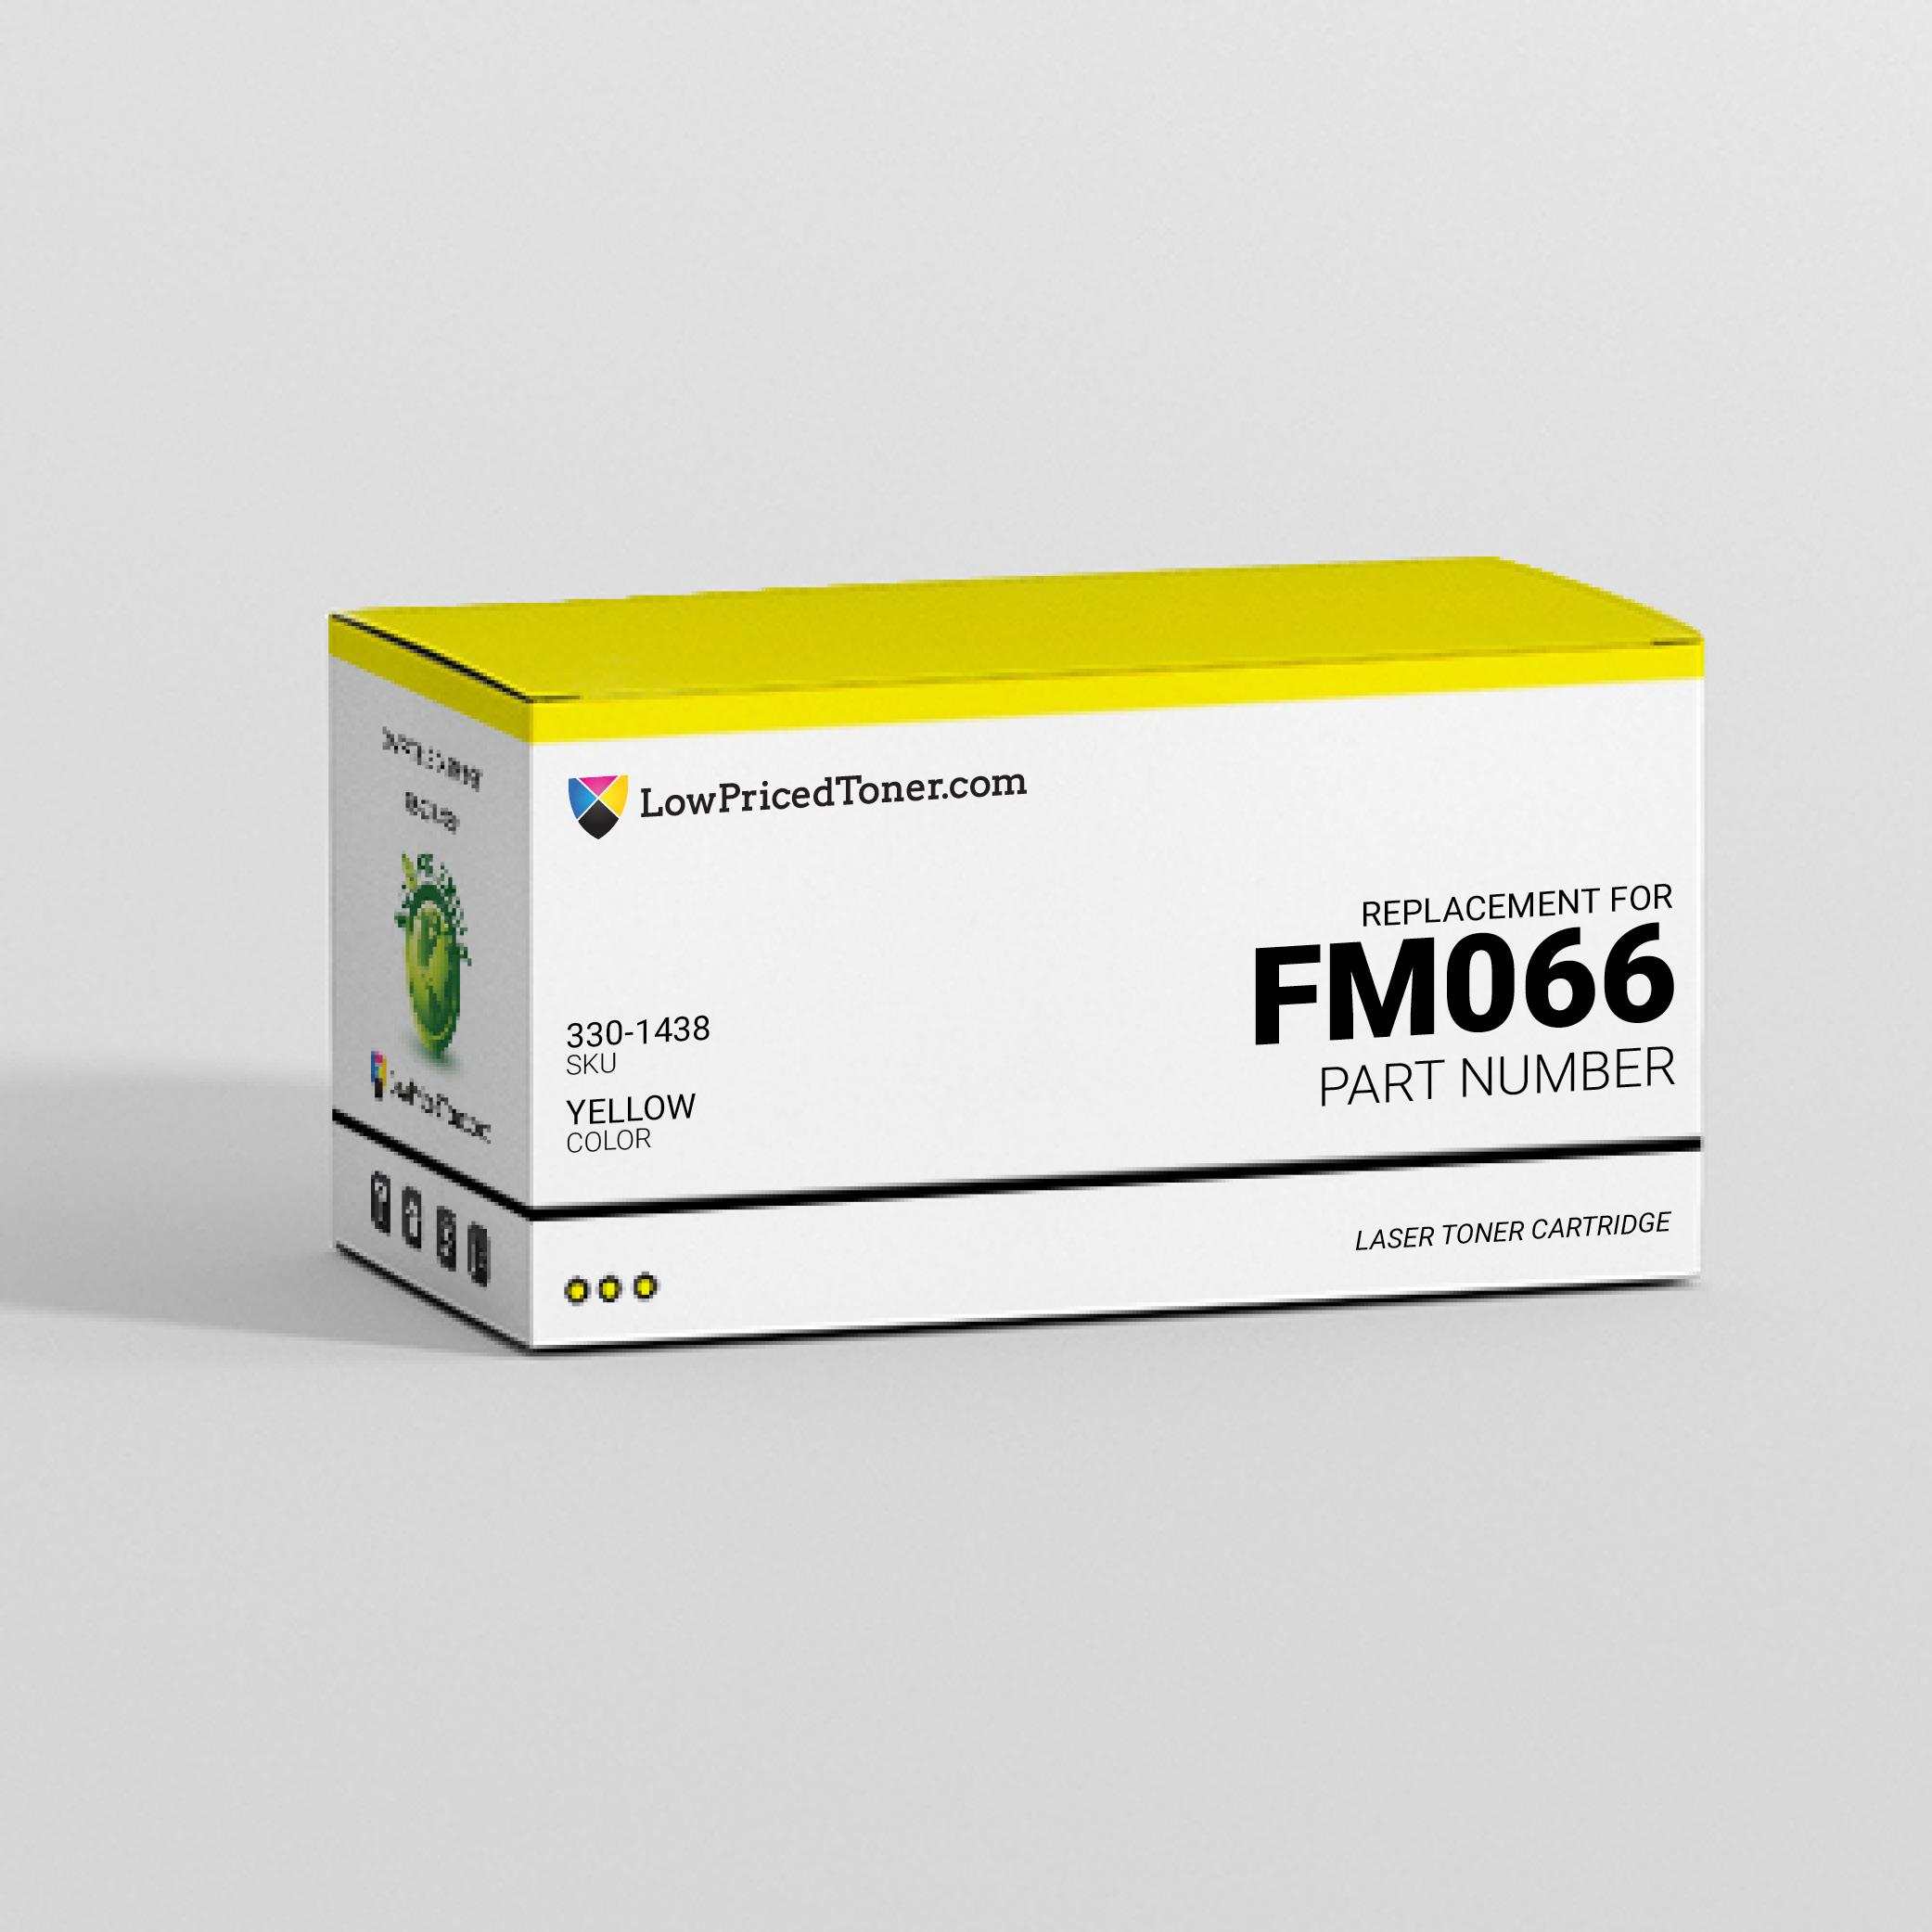 Dell 330-1438 FM066 Compatible Yellow Laser Toner Cartridge